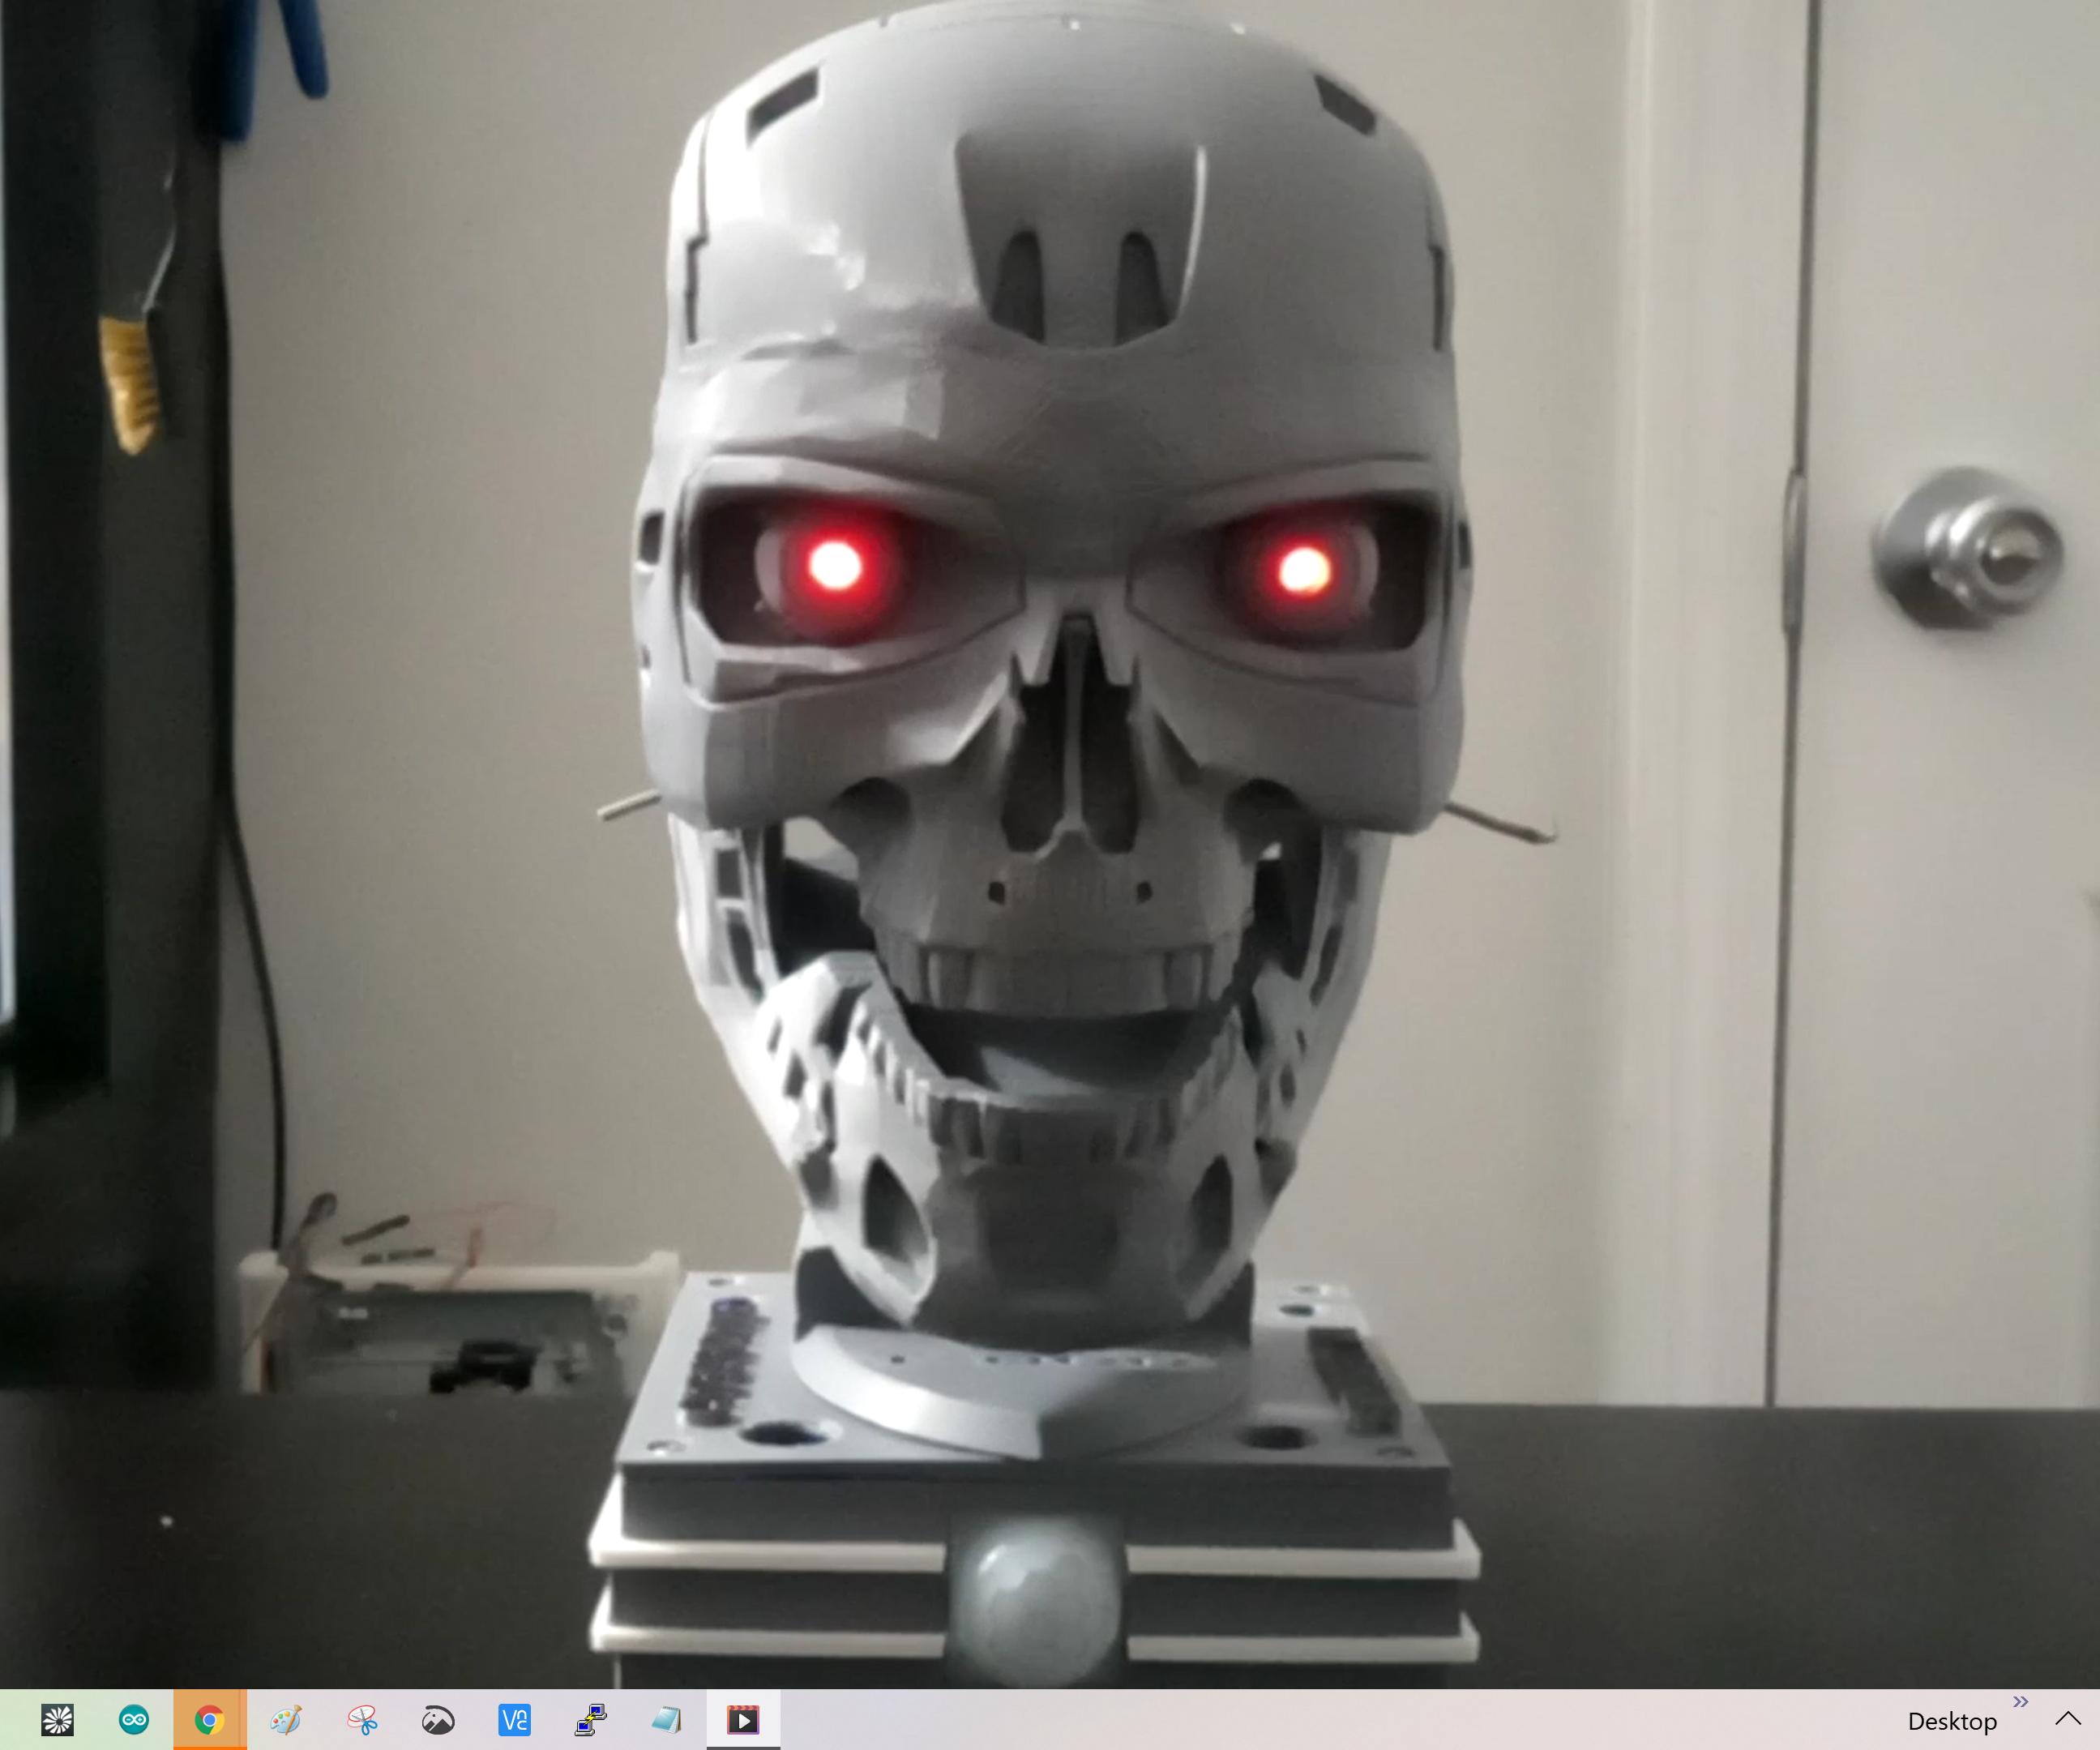 The Glowing Eyes Terminator T-800 Exo-skull